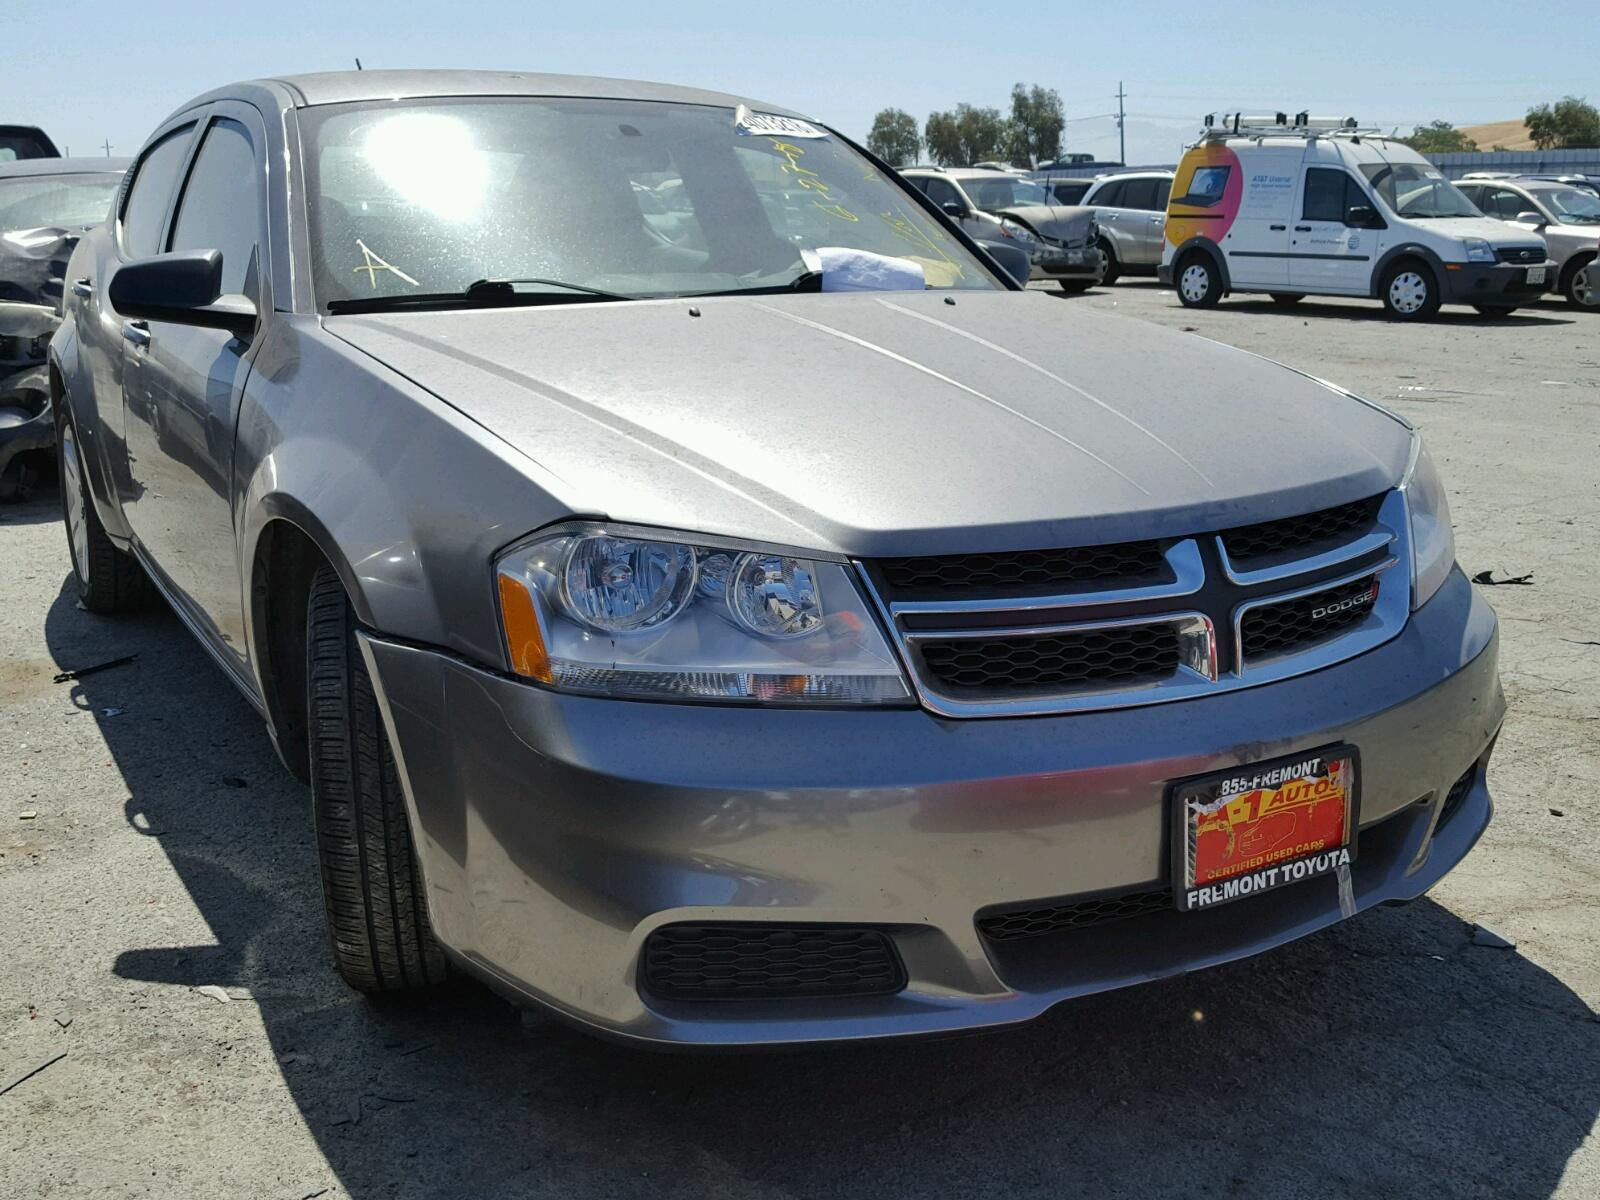 2012 Dodge Avenger SE for sale at Copart Martinez CA Lot